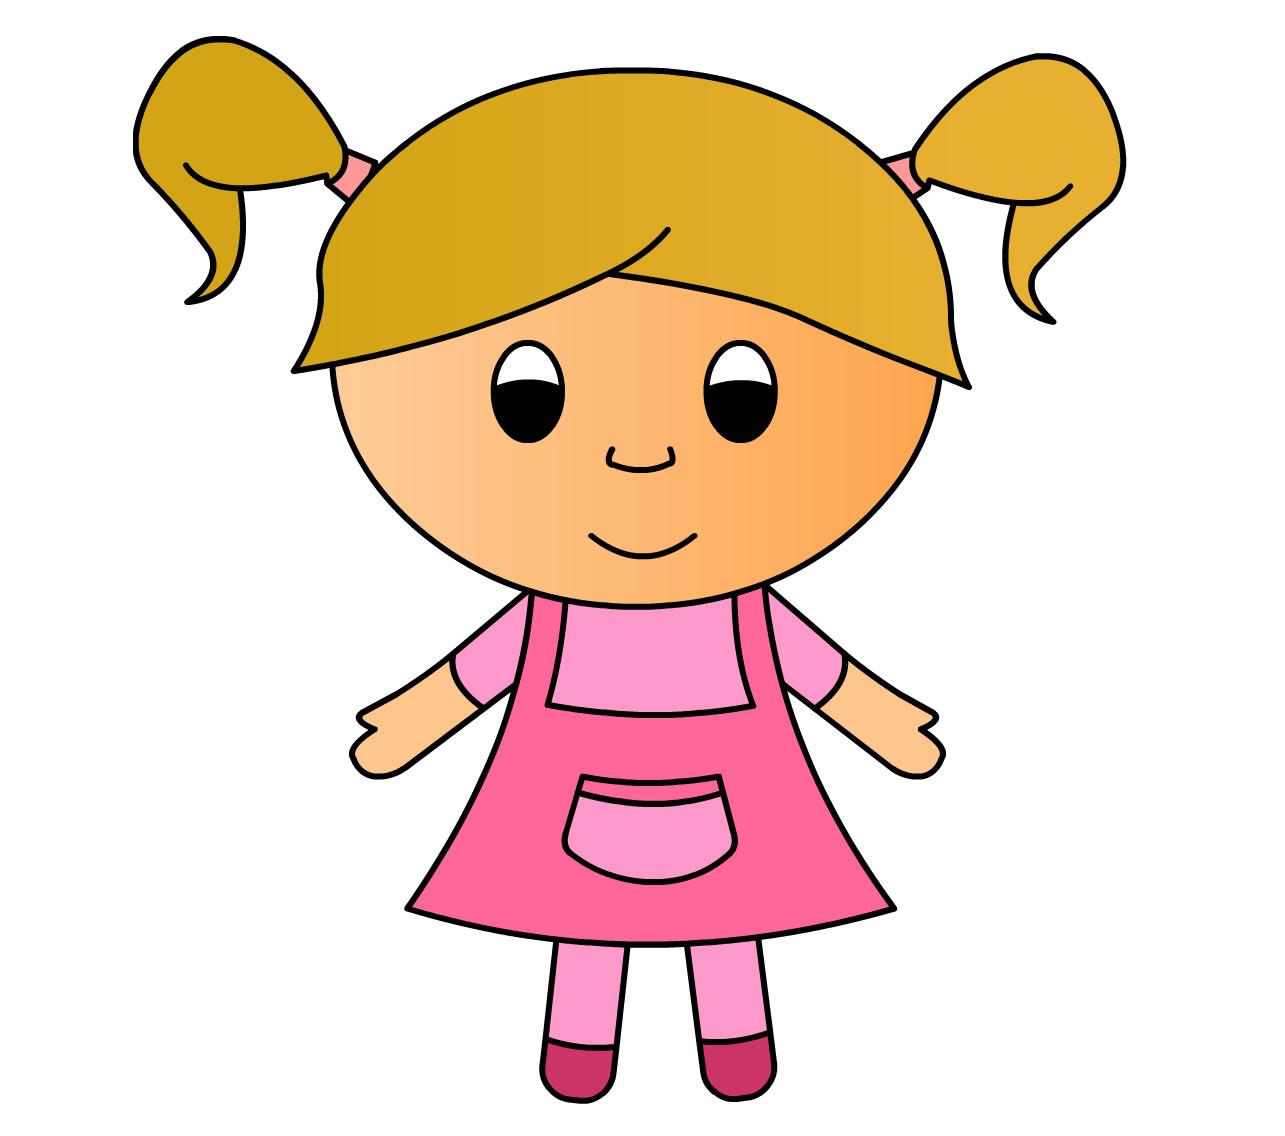 Free Little Girl Illustration, Download Free Clip Art, Free.